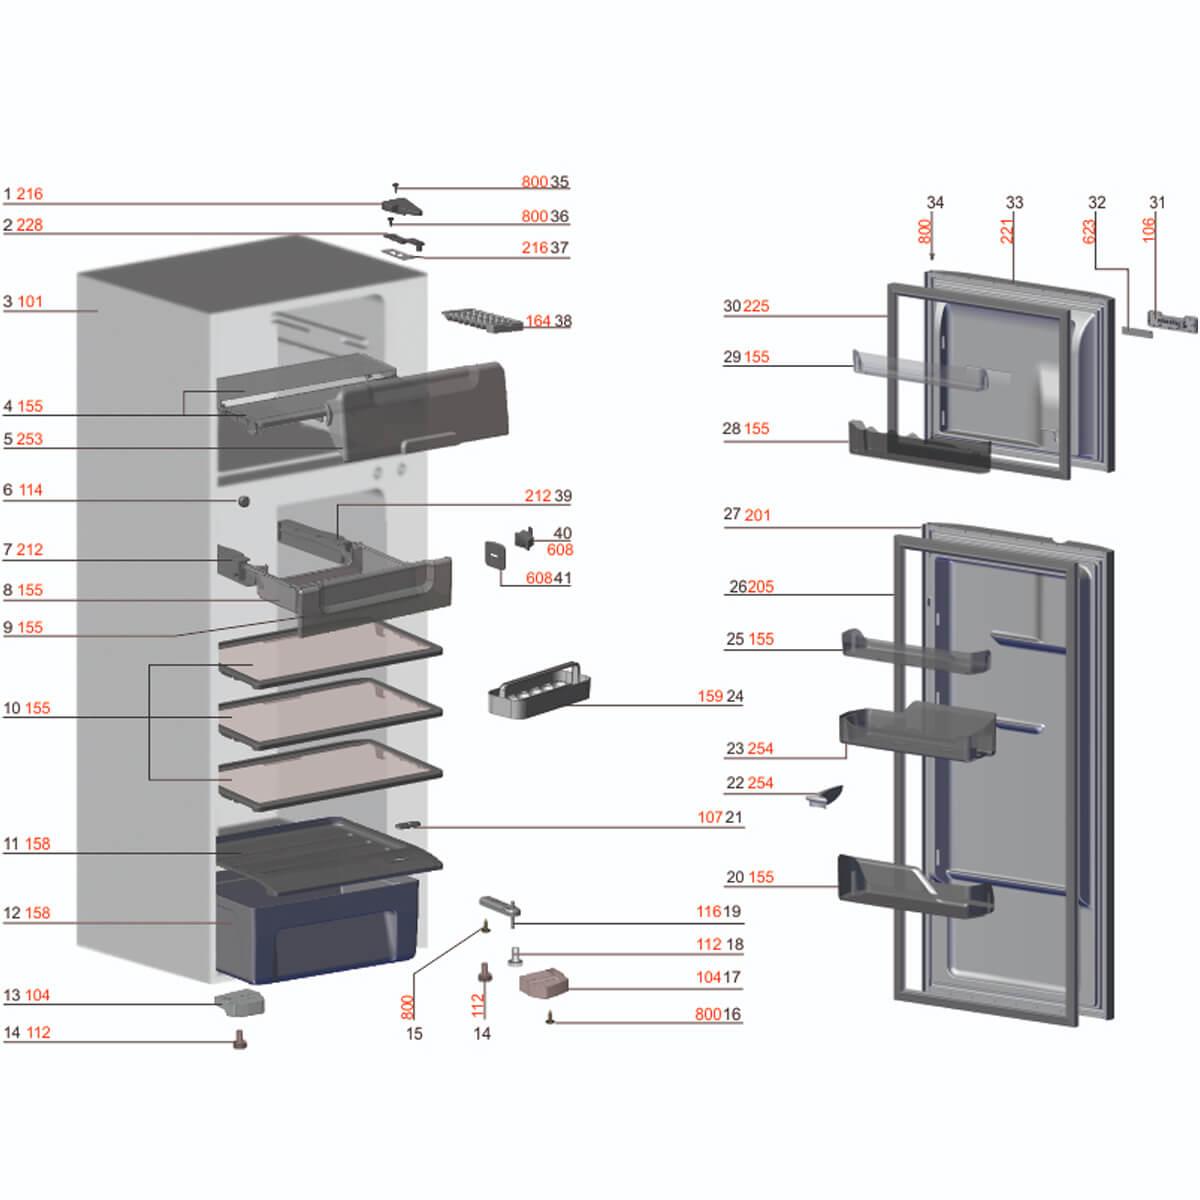 Prateleira Drink Express Para Refrigerador Electrolux DFN39 DFX39 DFN41 DFX41 - 67404018